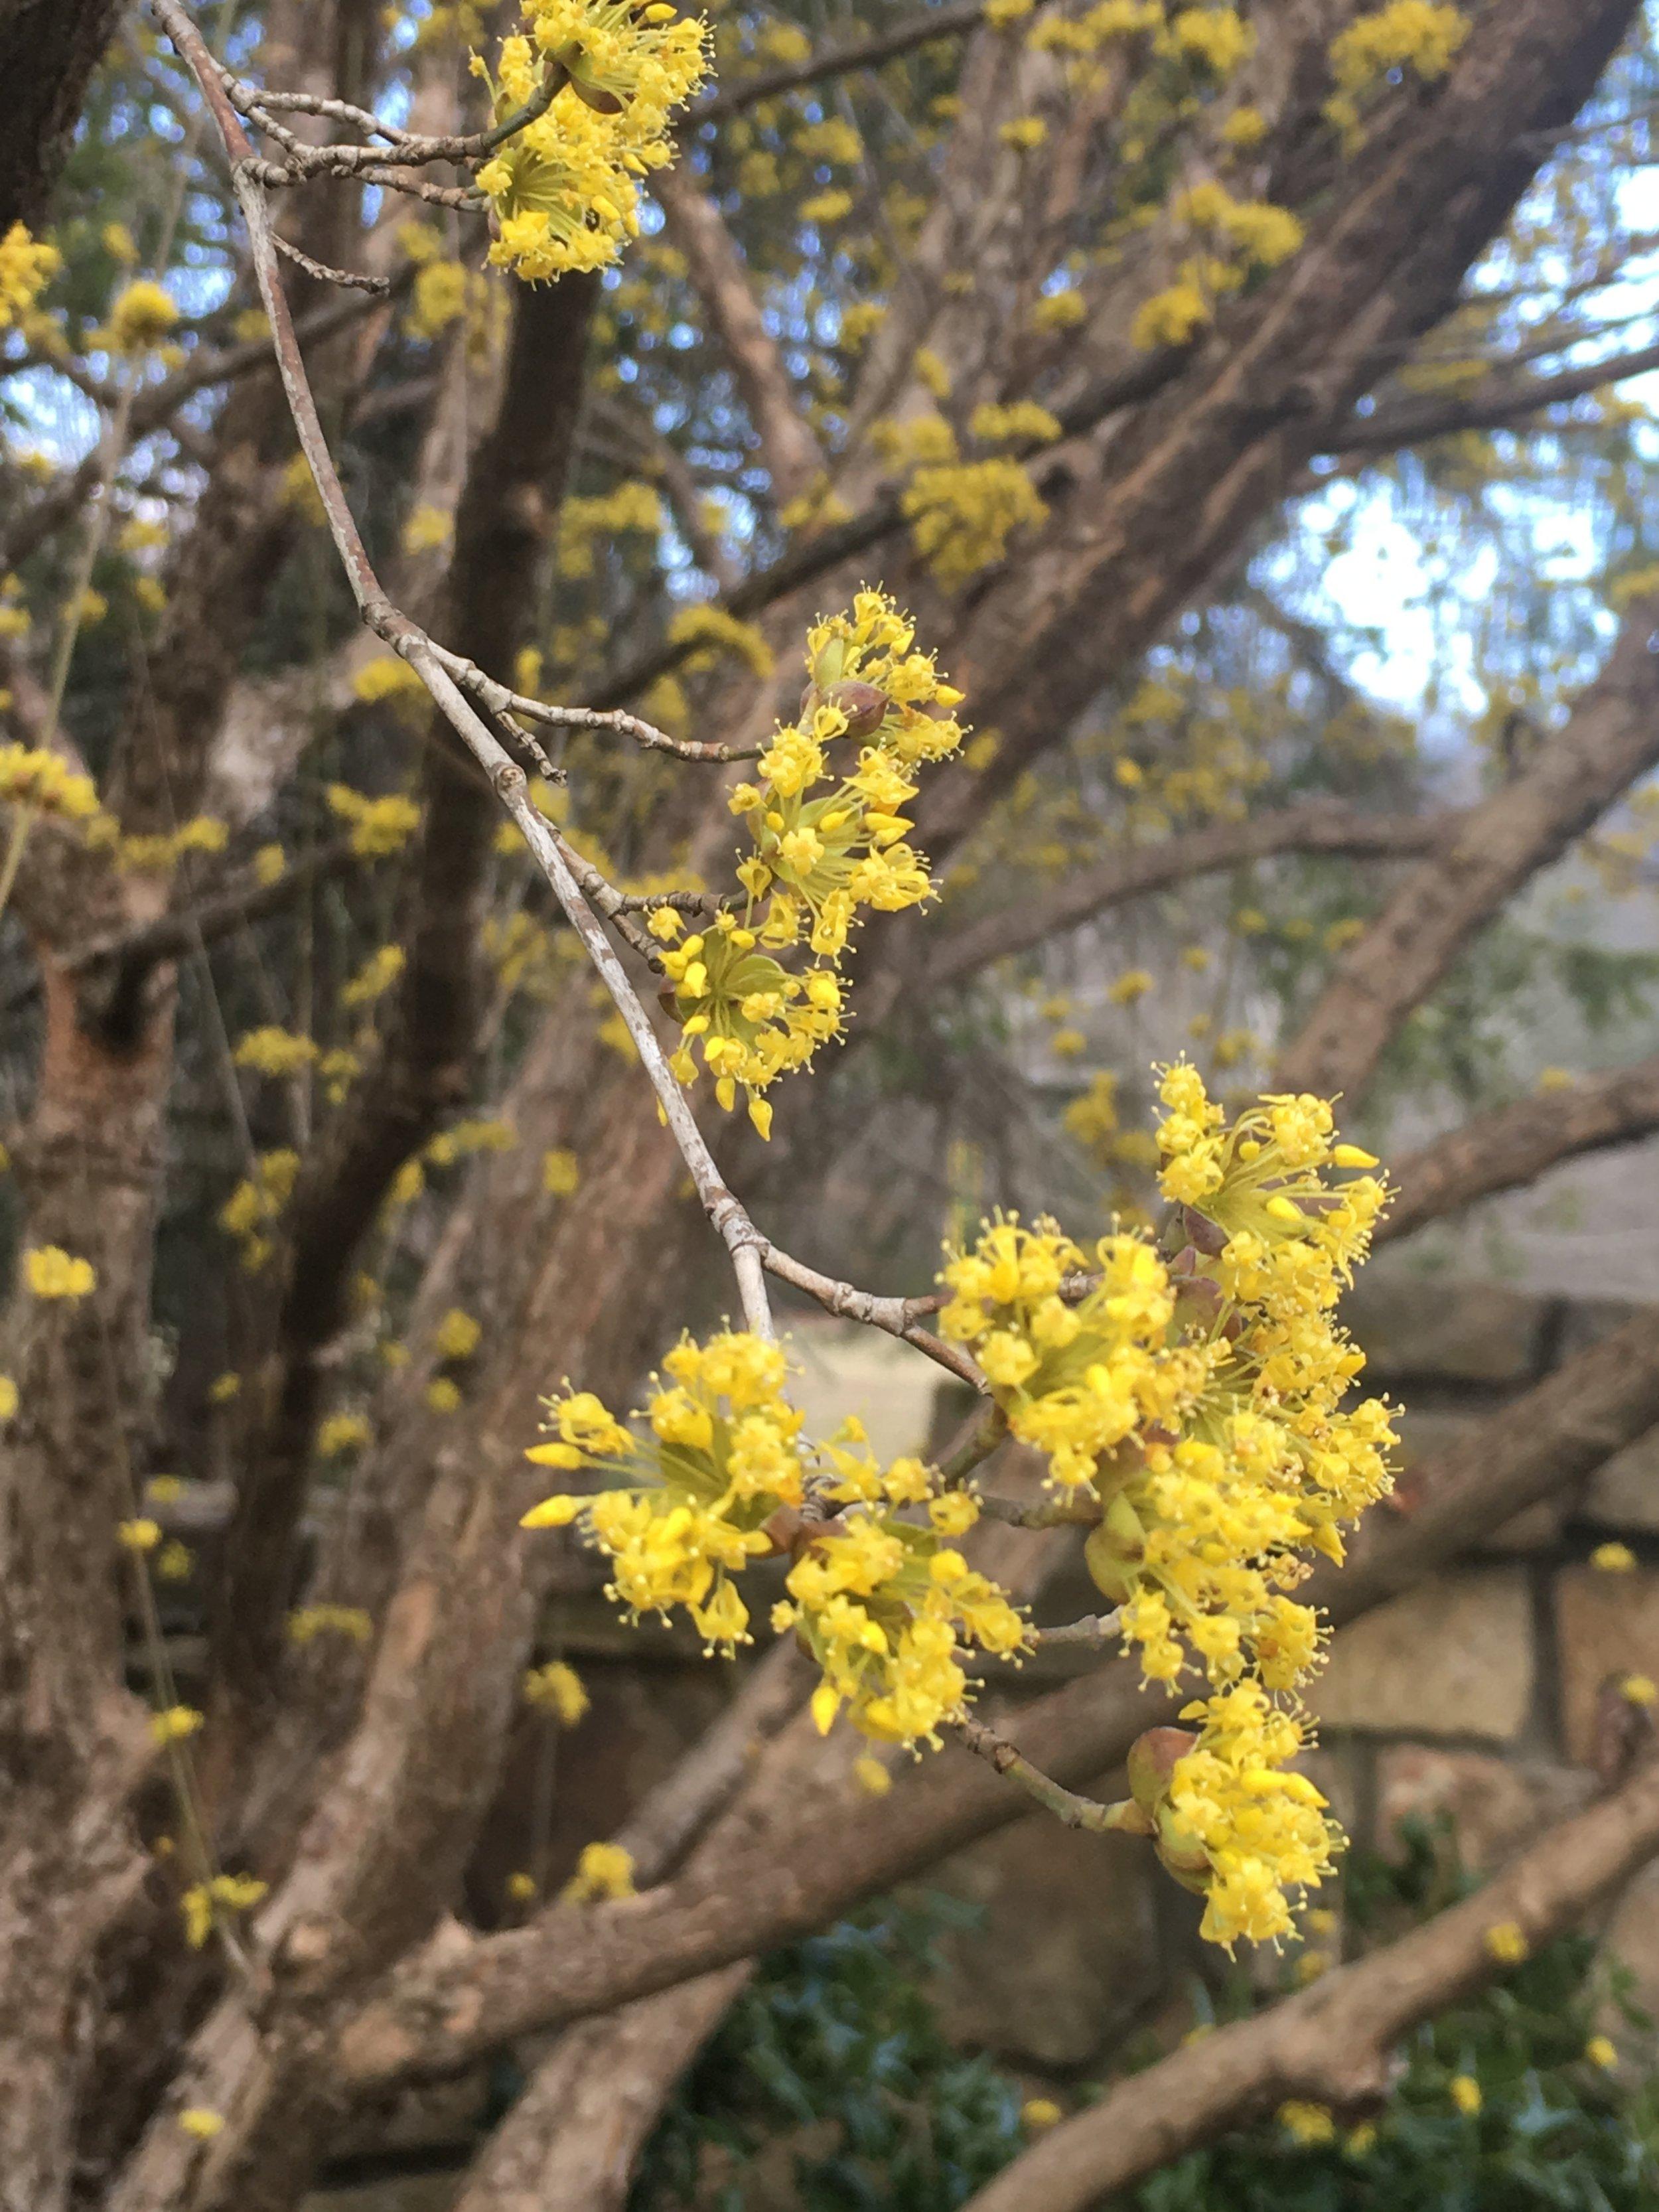 Cornelian cherry dogwood blooms